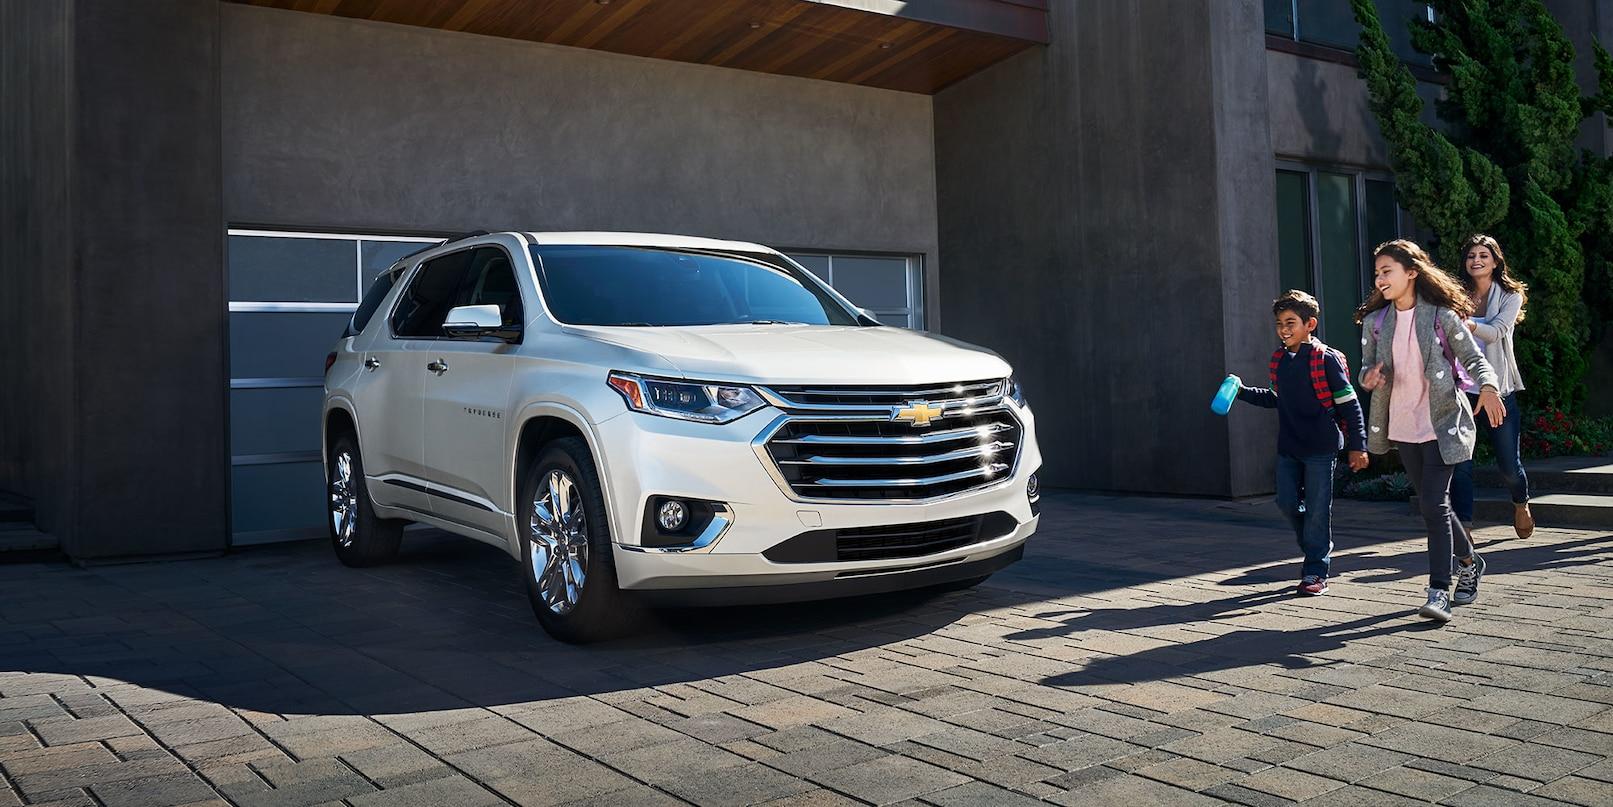 2019 Chevrolet Traverse Leasing near Fairfax, VA